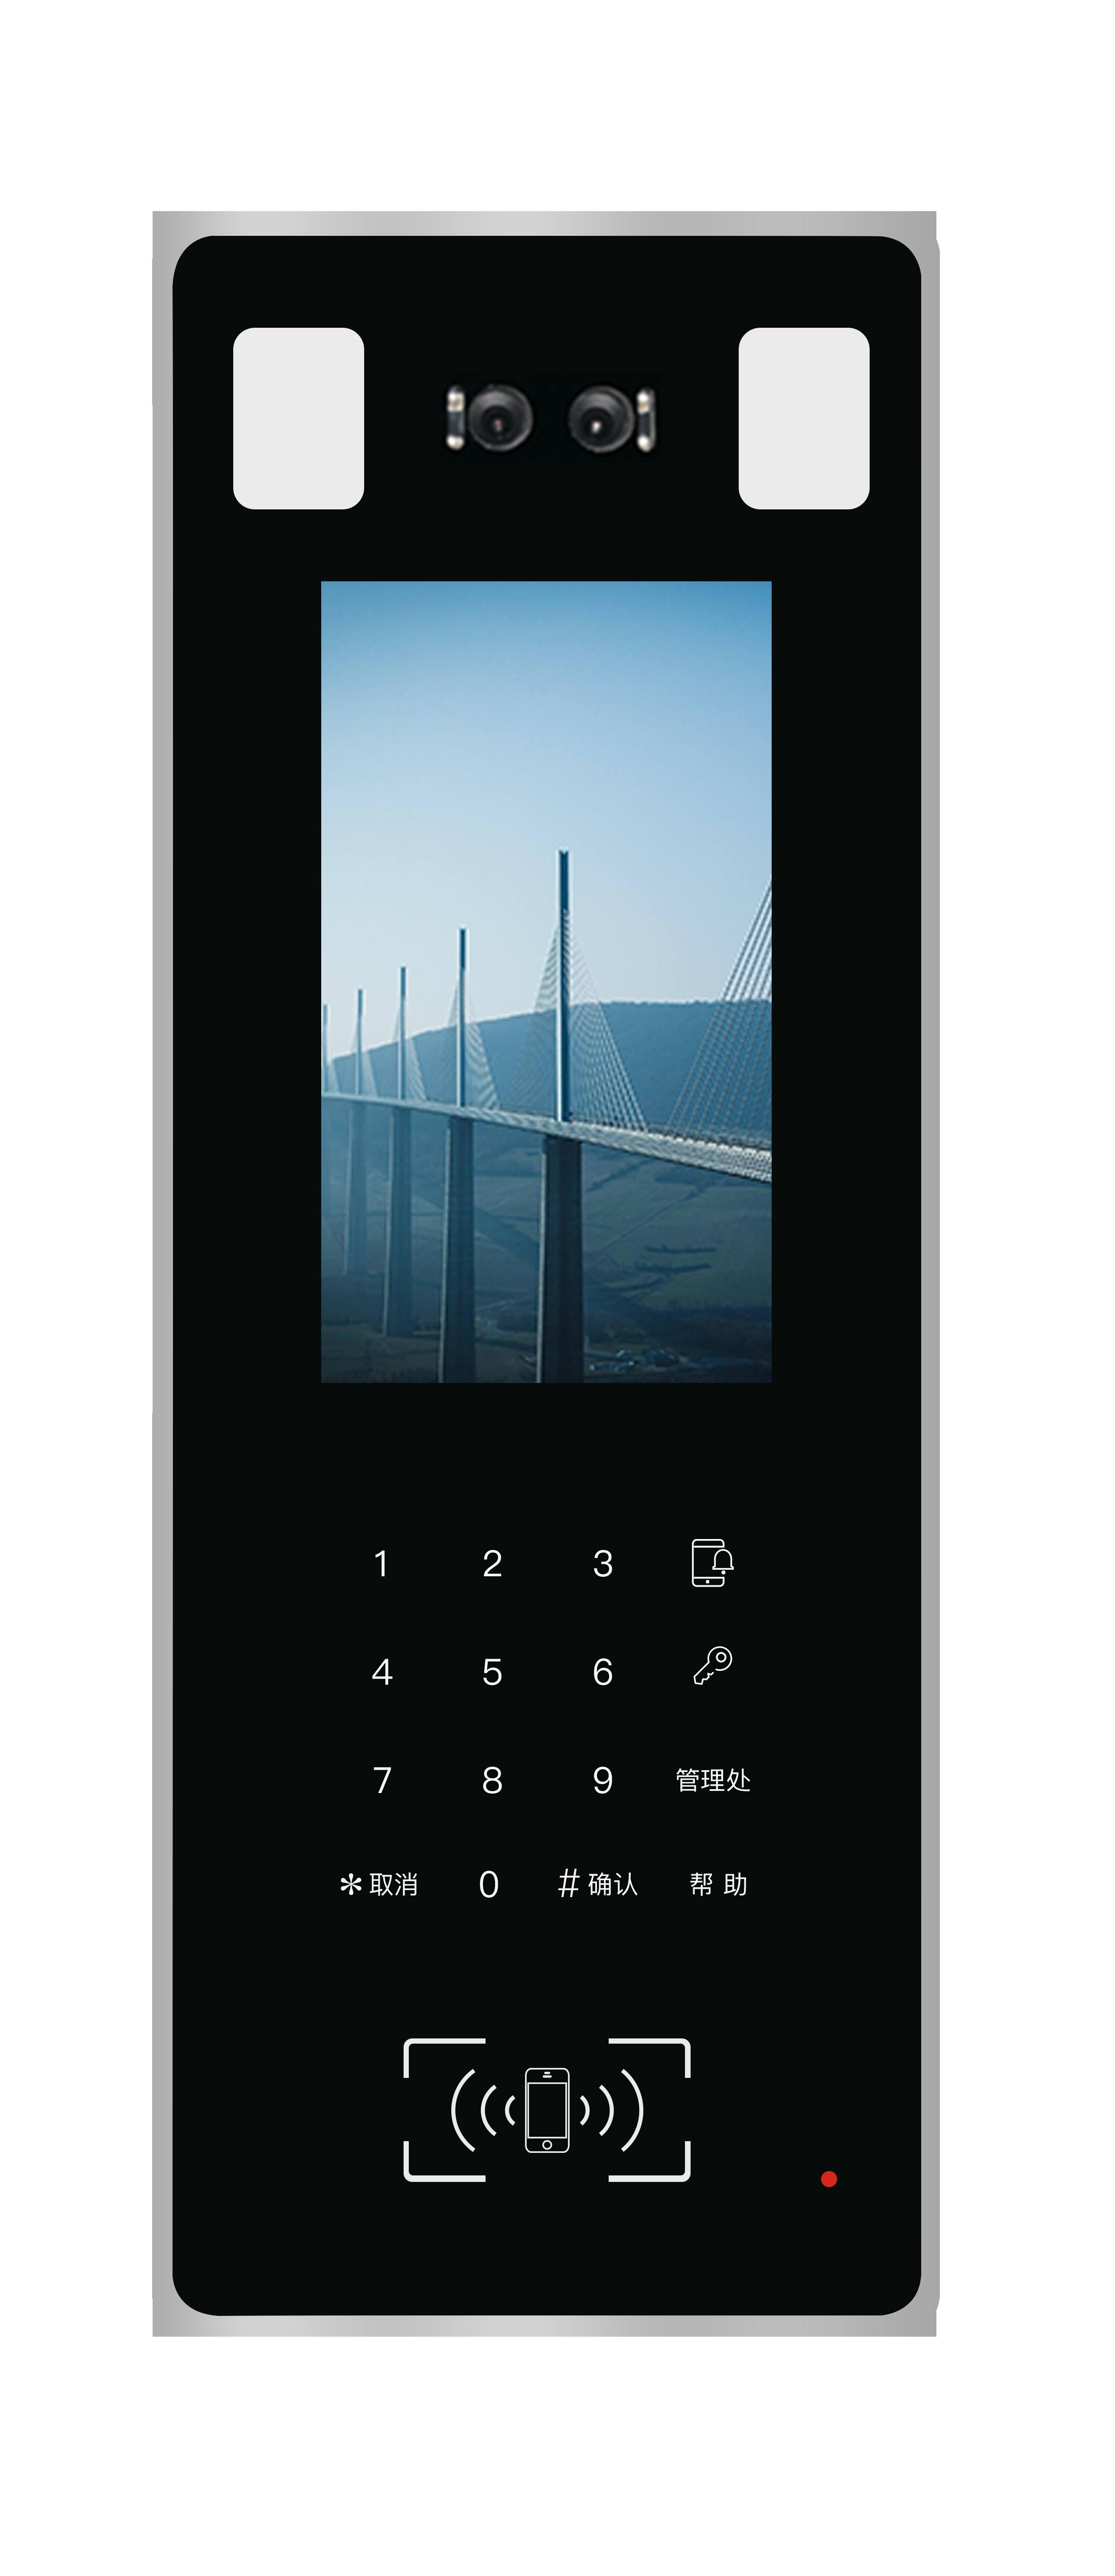 vf716